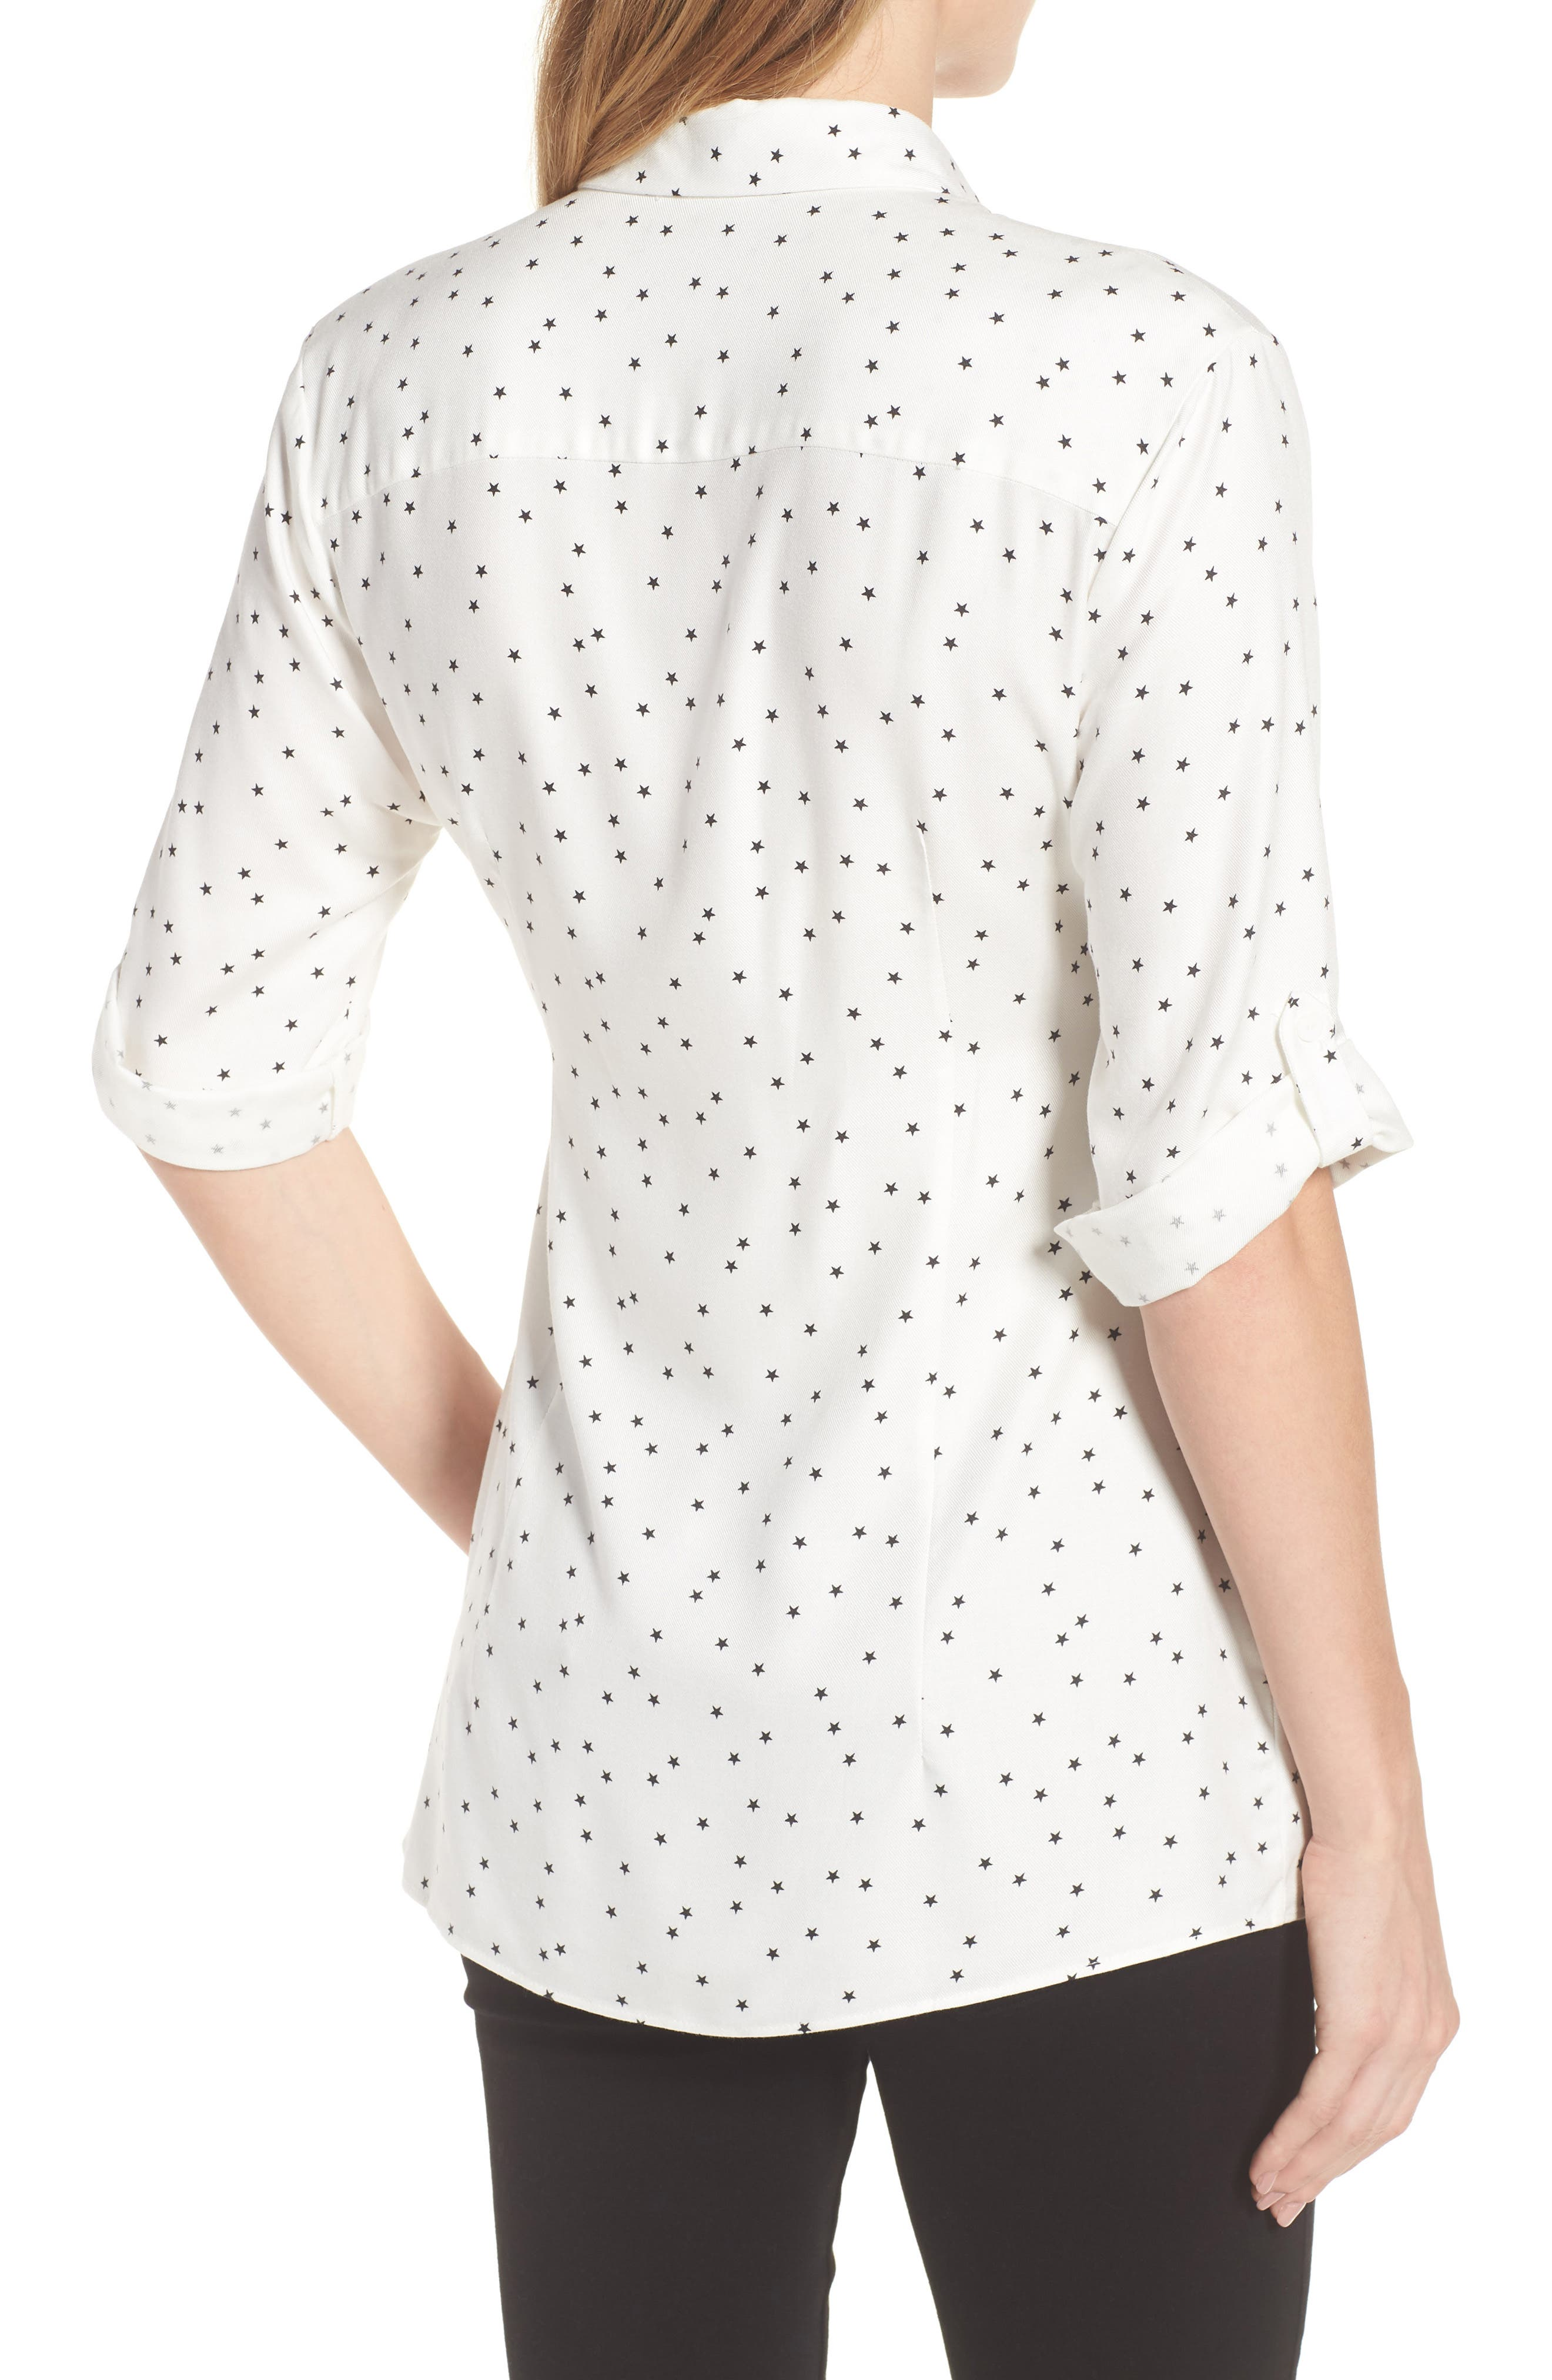 Selina Maternity Shirt,                             Alternate thumbnail 2, color,                             Off White Star Print